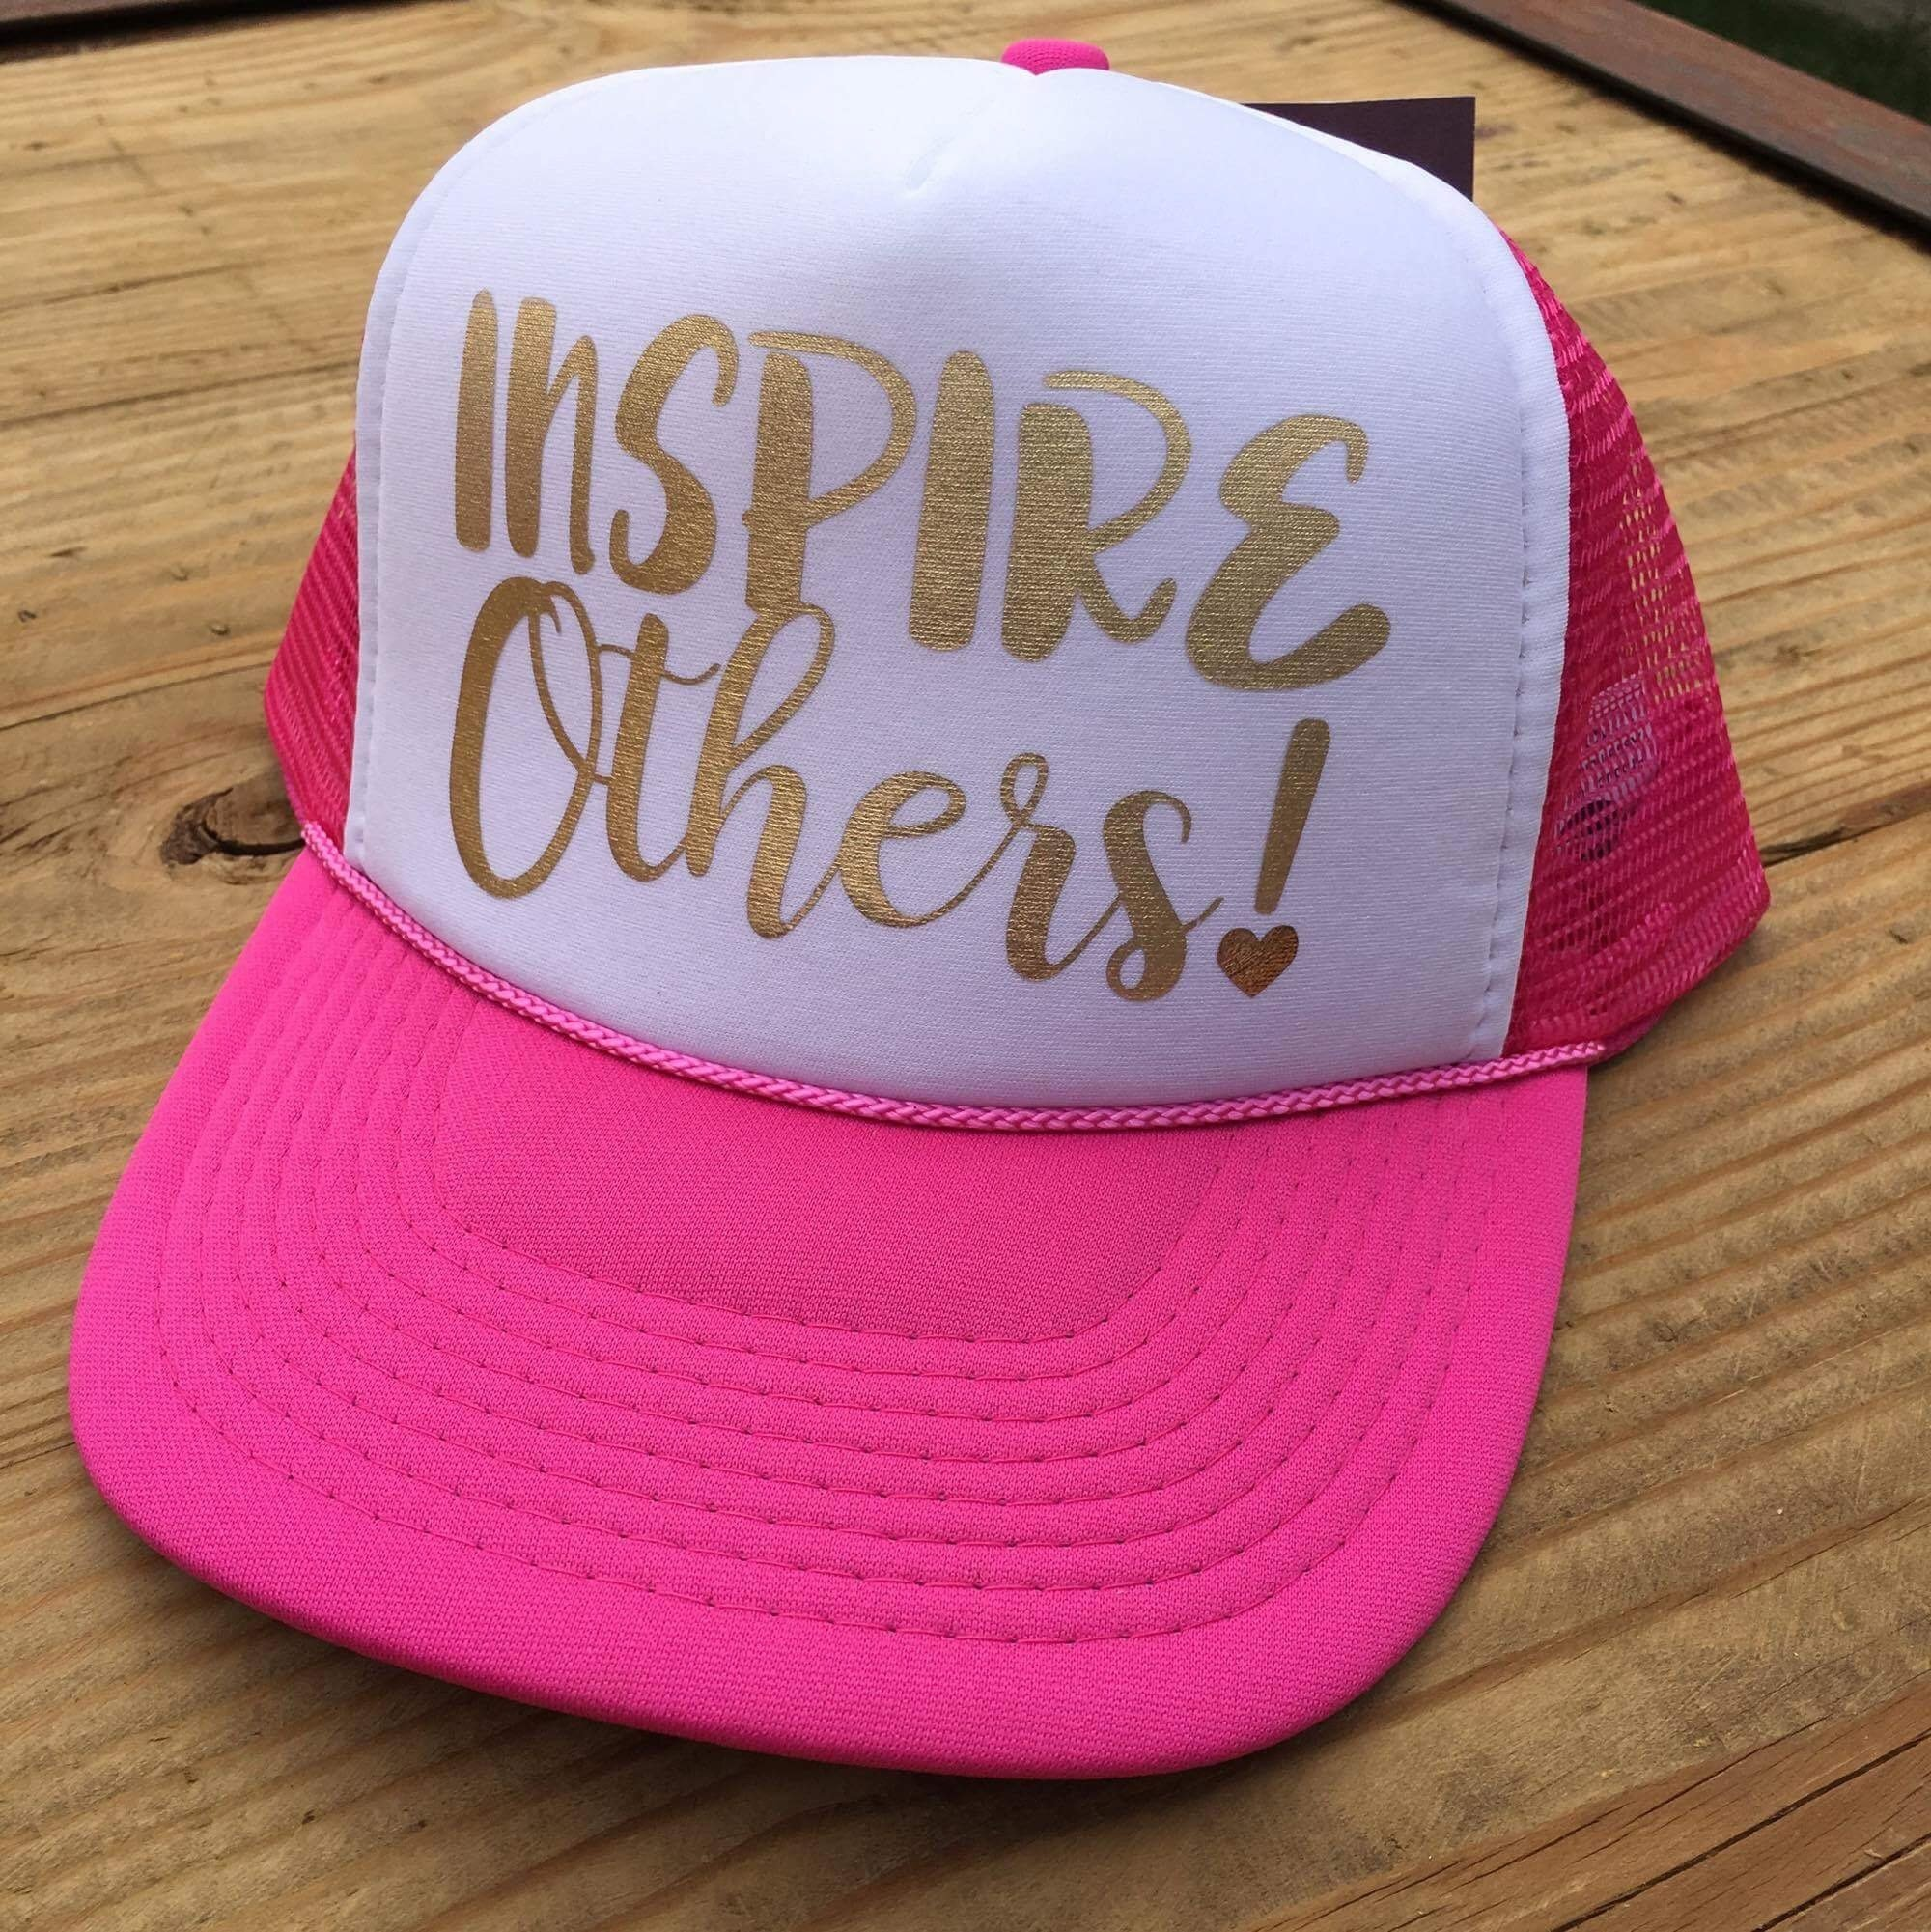 Trucker Hat - Inspire Others 00002